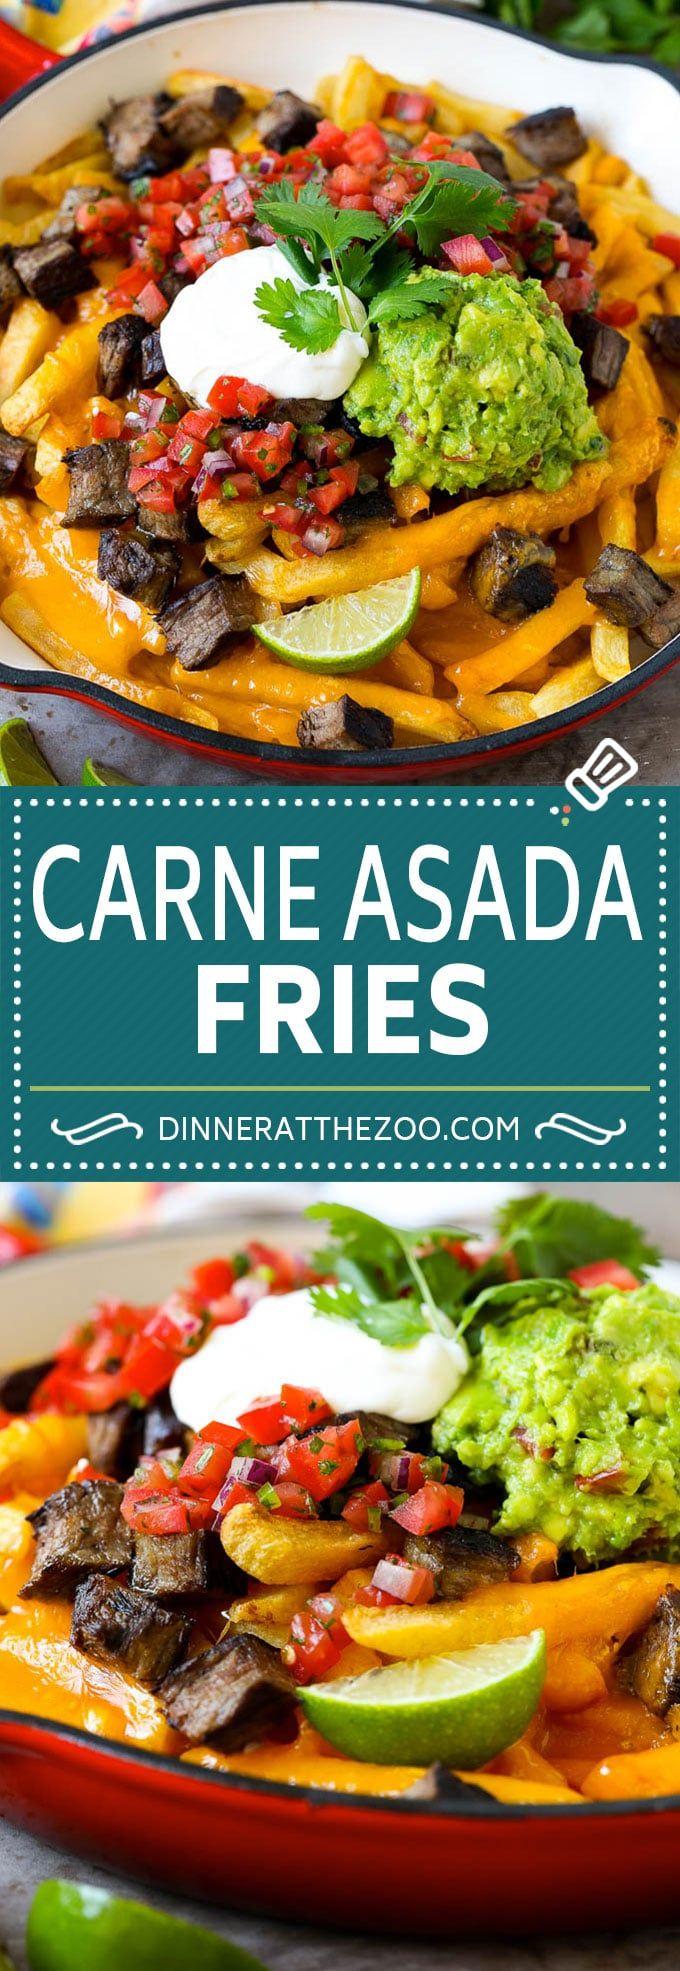 Carne Asada Fries Recipe | Steak Fries